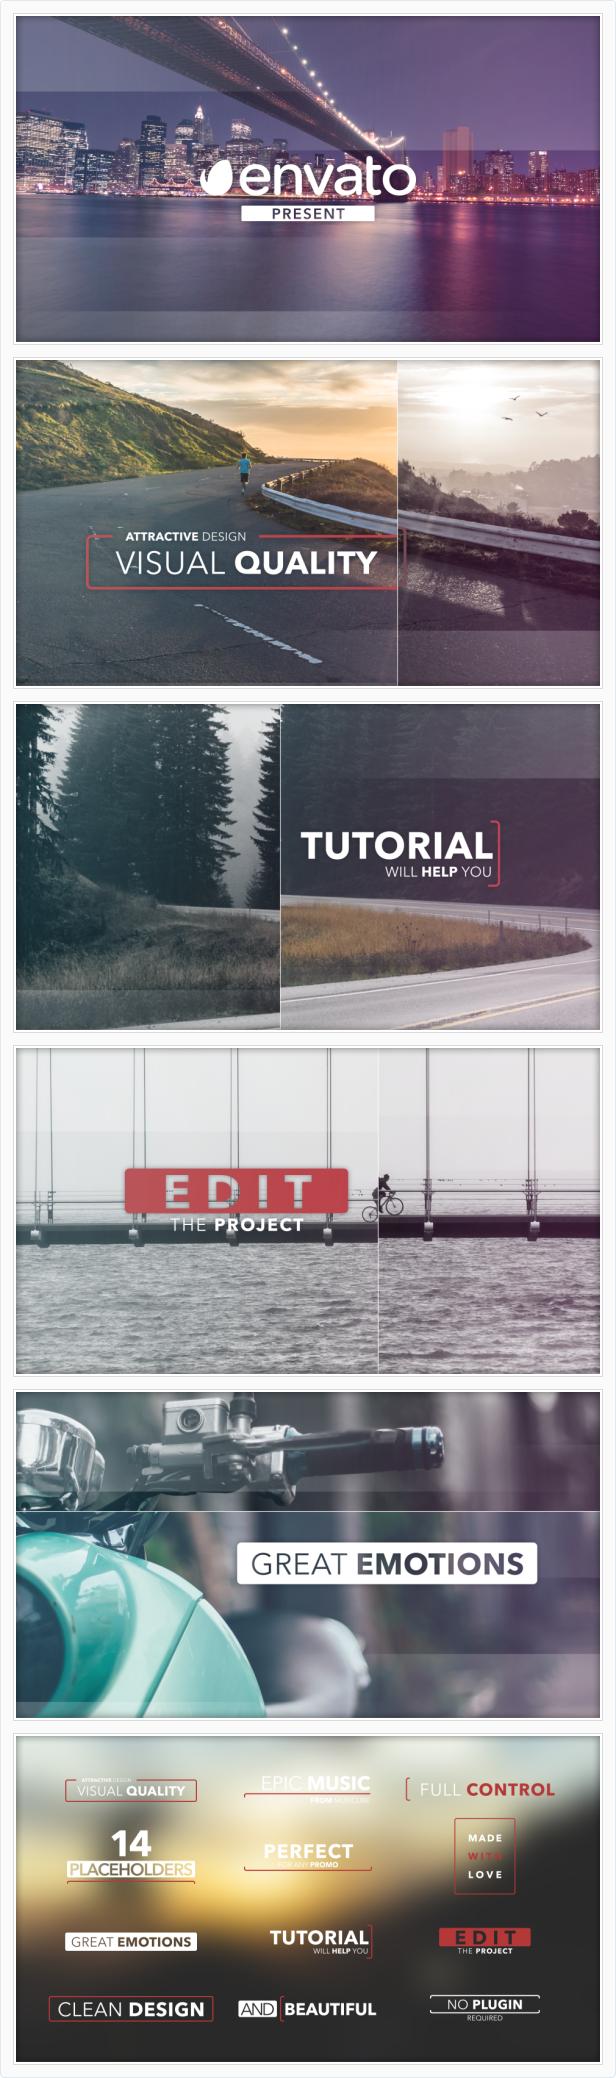 Simple Photo Slideshow - 1